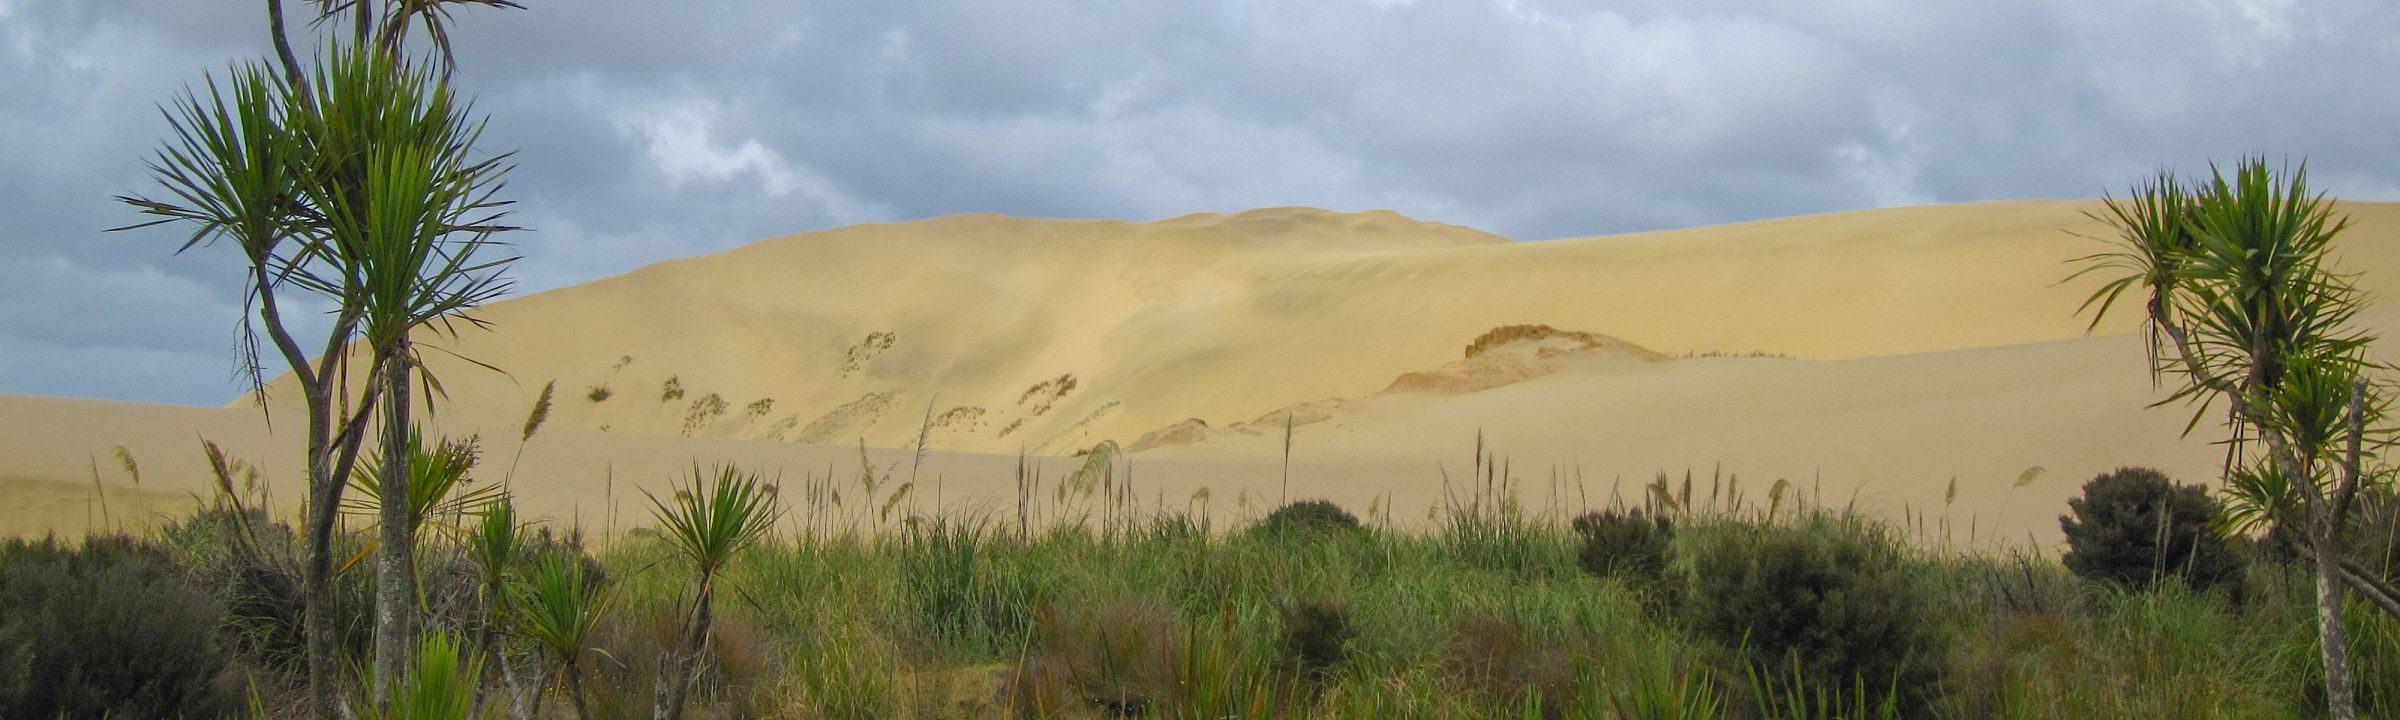 Te Paki – Sanddünen mitten im Grünen